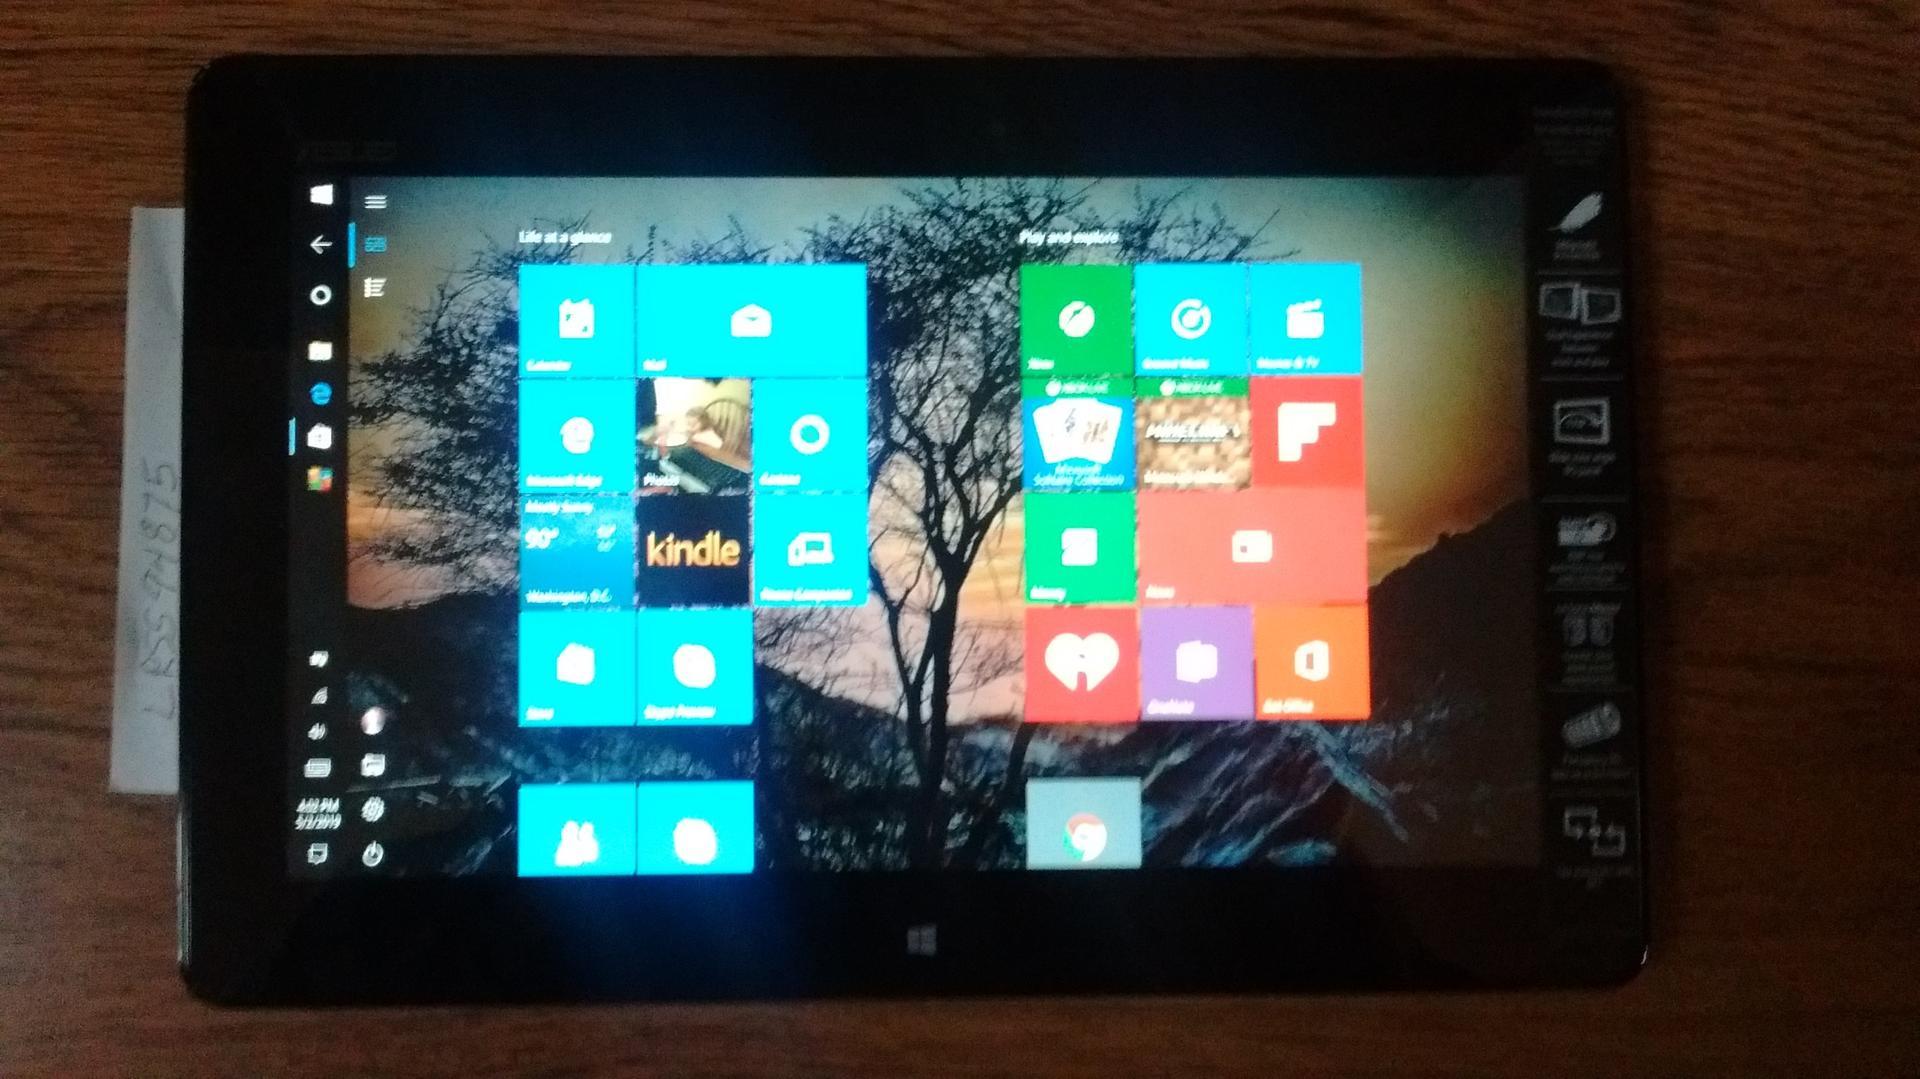 Asus VivoTab Smart ME400C (Wi-Fi) - Black, 64 GB